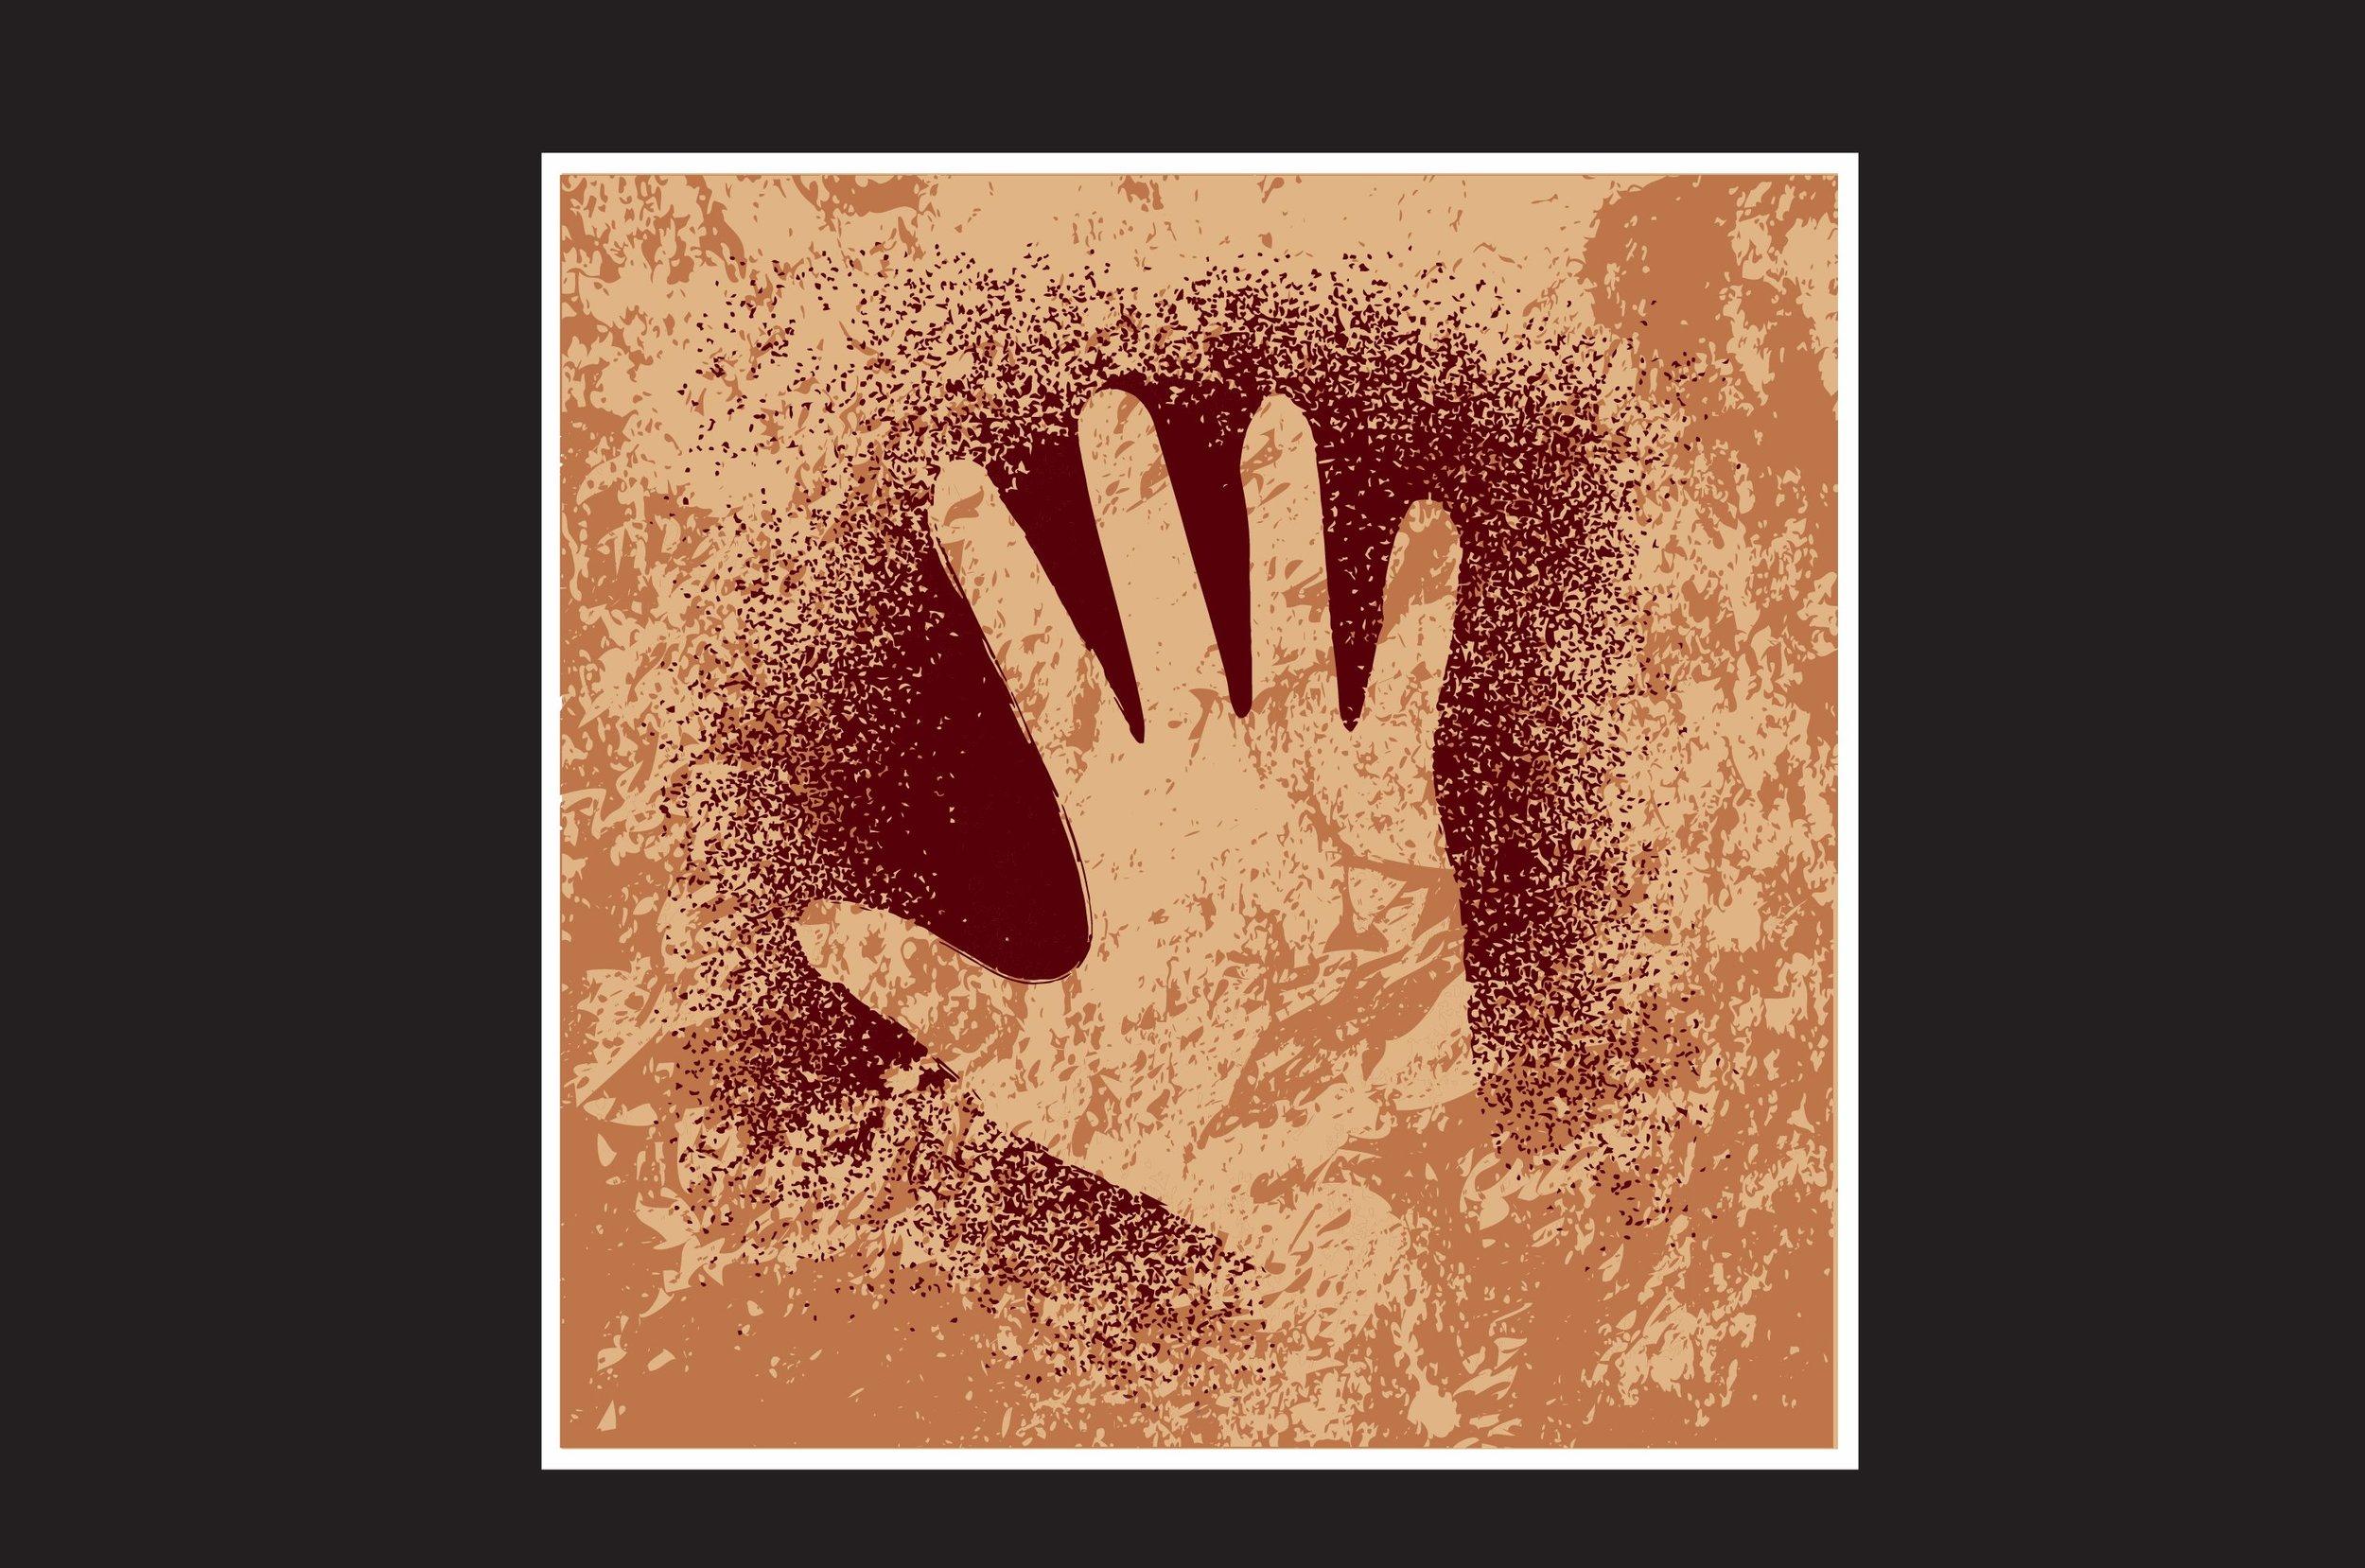 CavePictures_Logo-1-e1509491021608.jpg